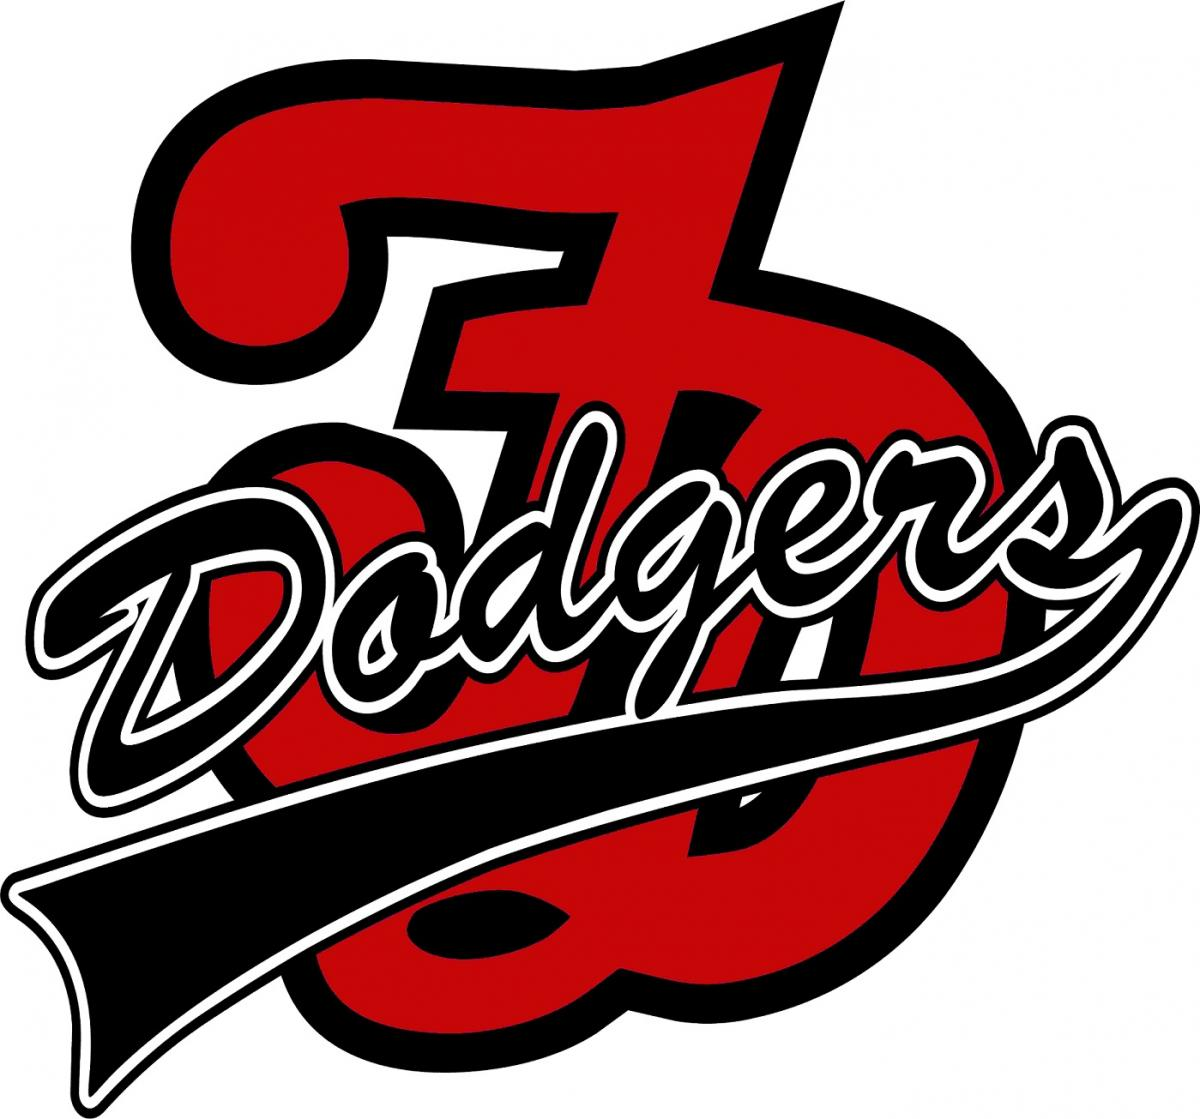 Fort Dodge School District logo